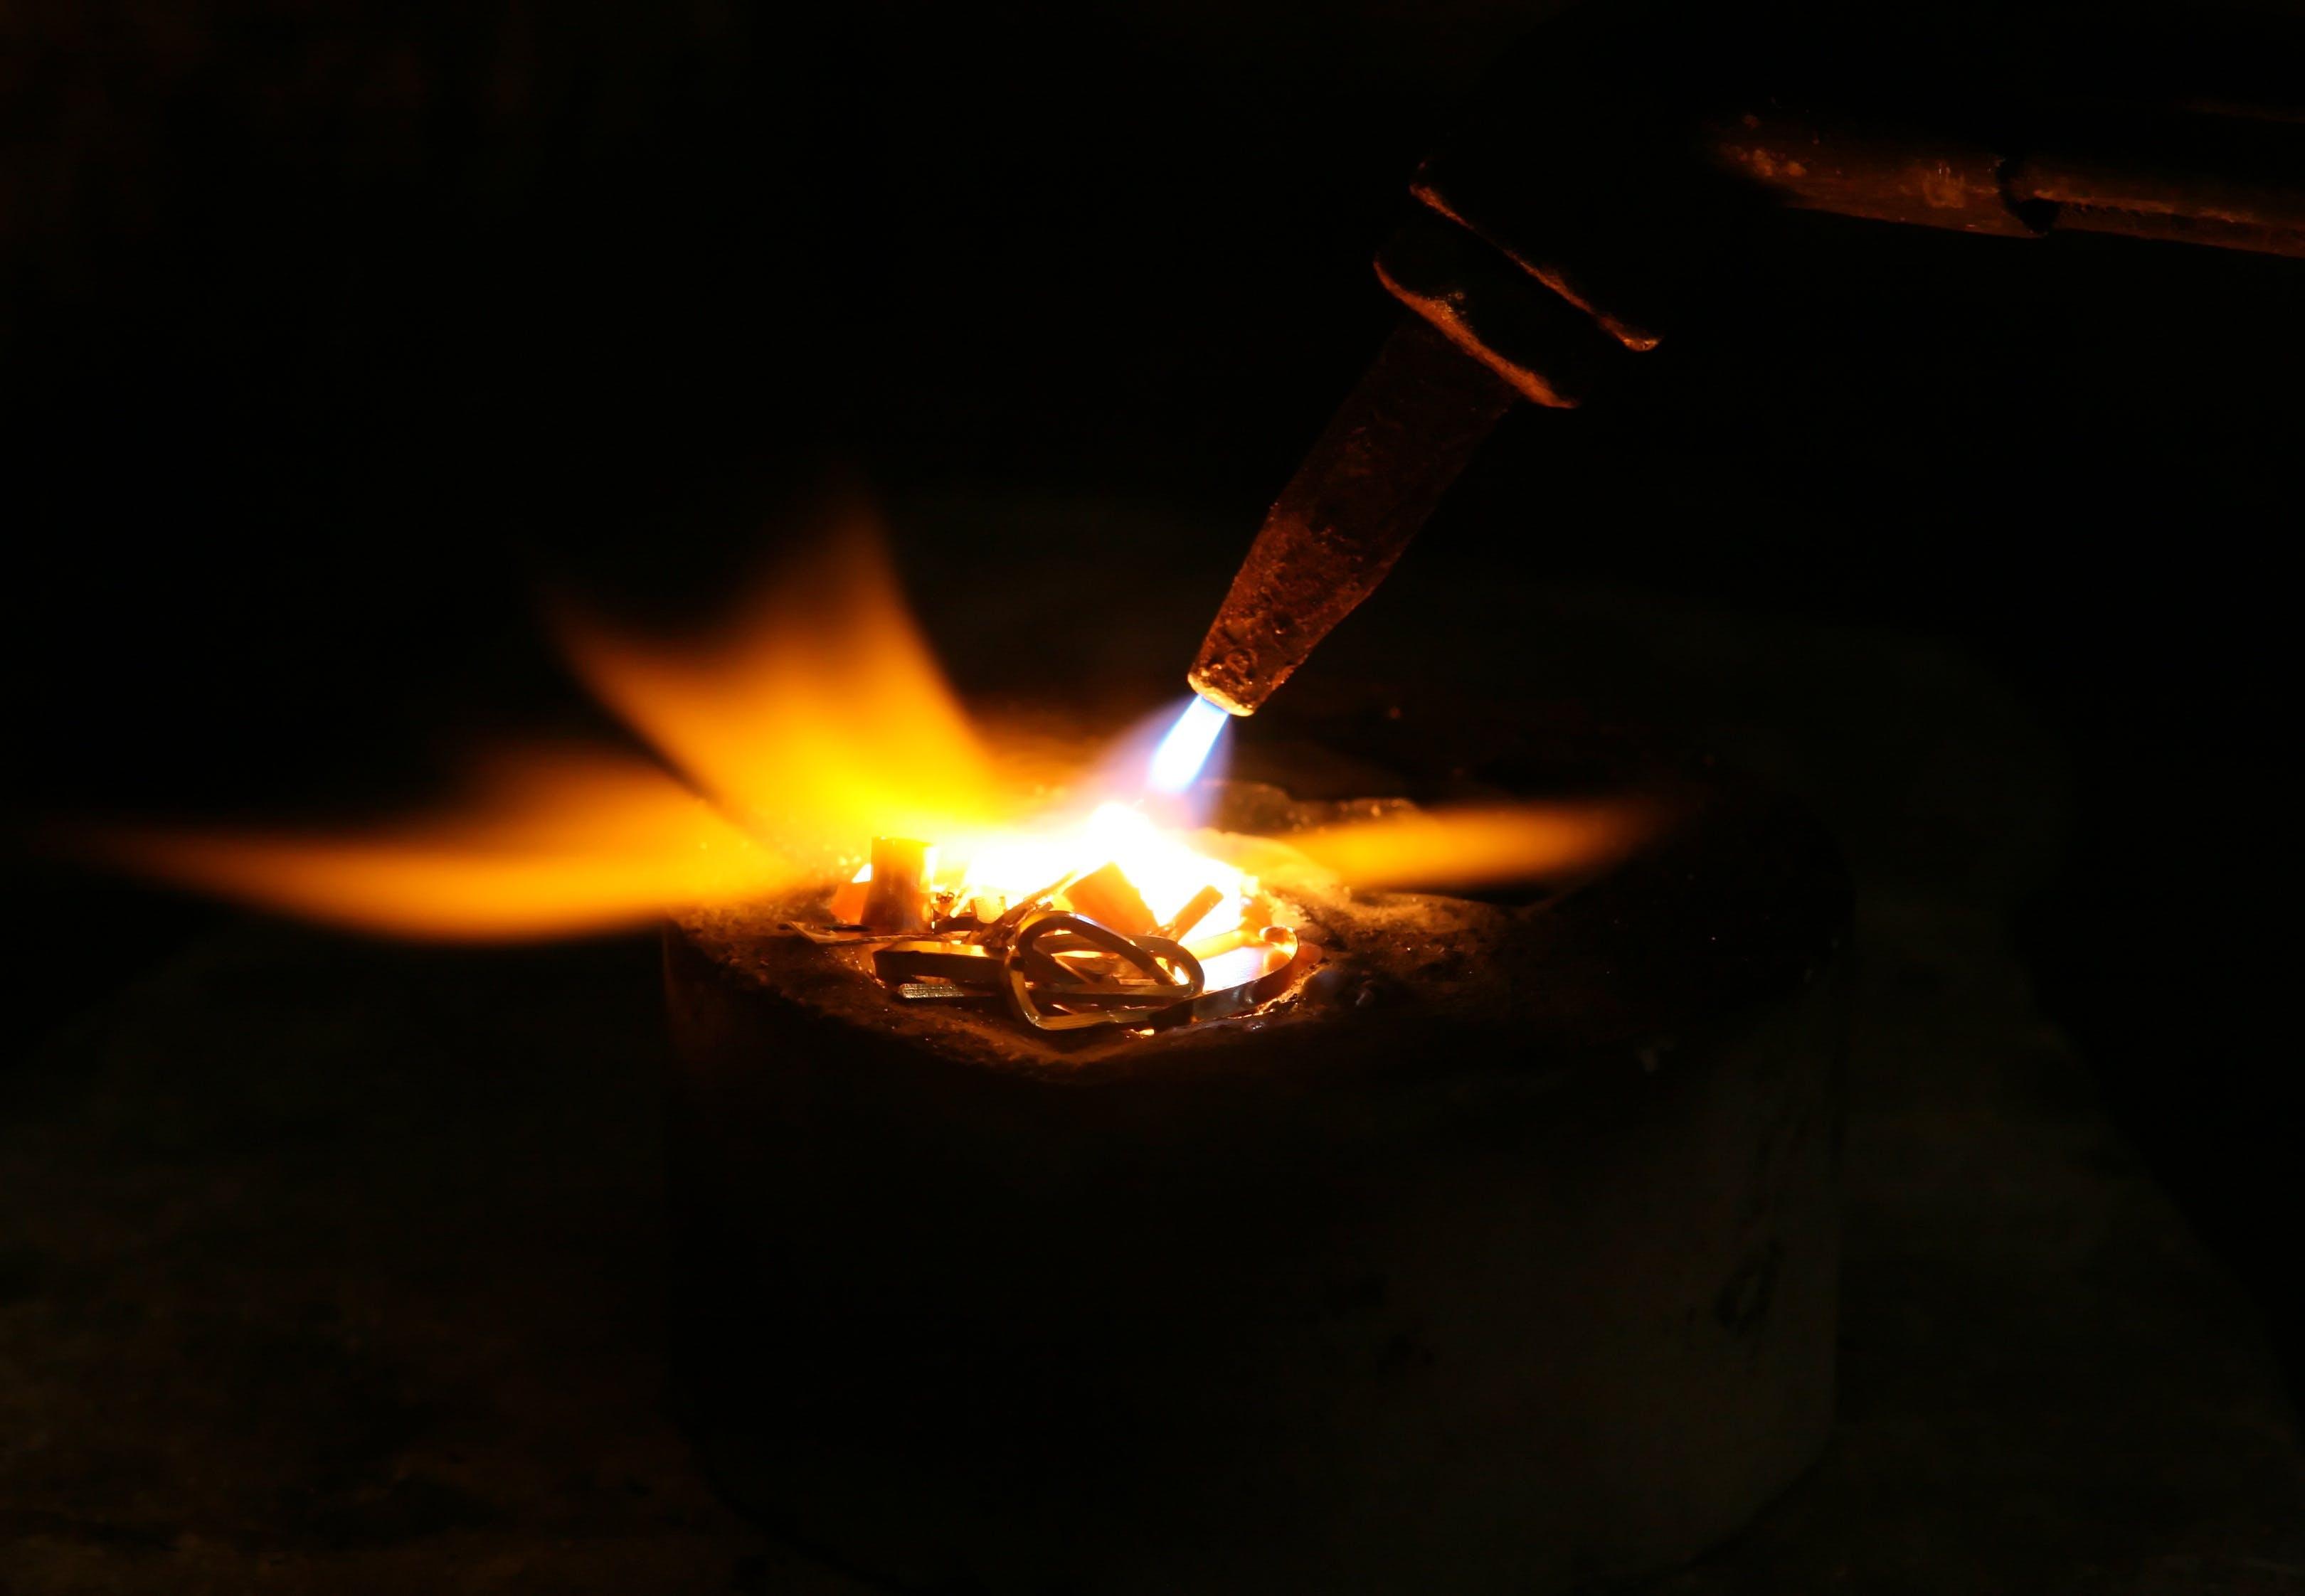 Free stock photo of light, industry, metal, pot